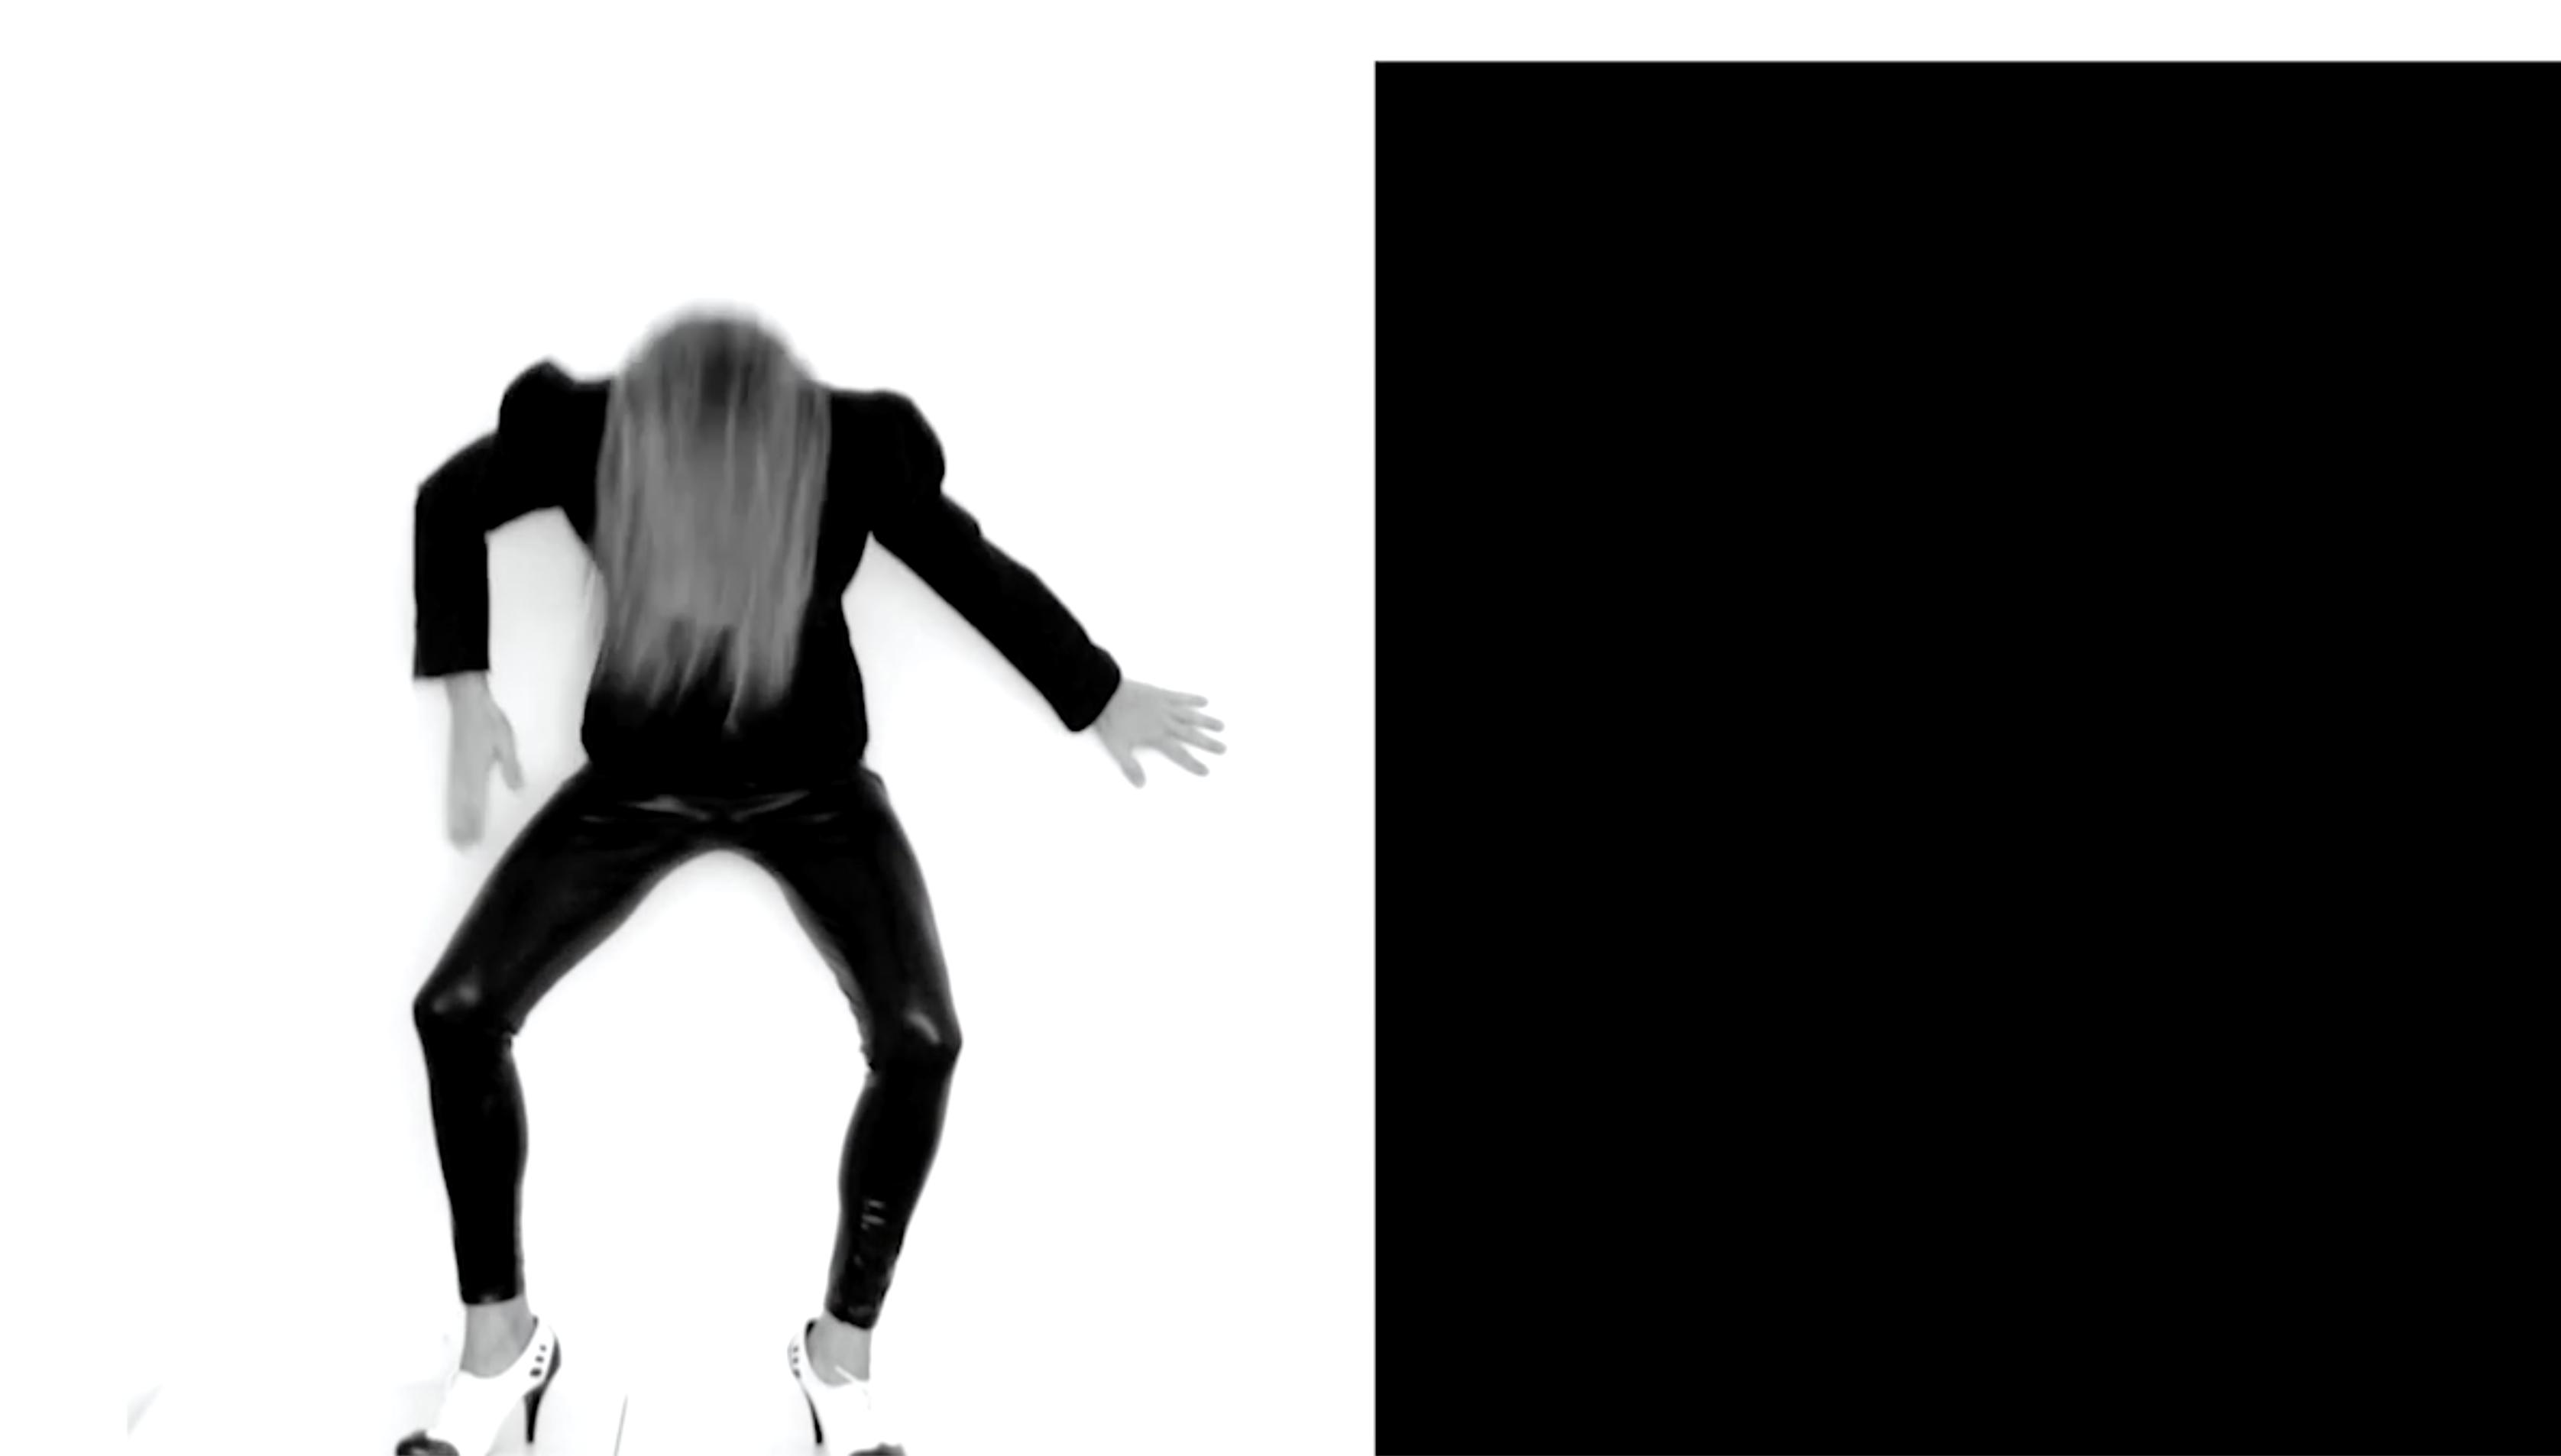 kharma estrany video arte